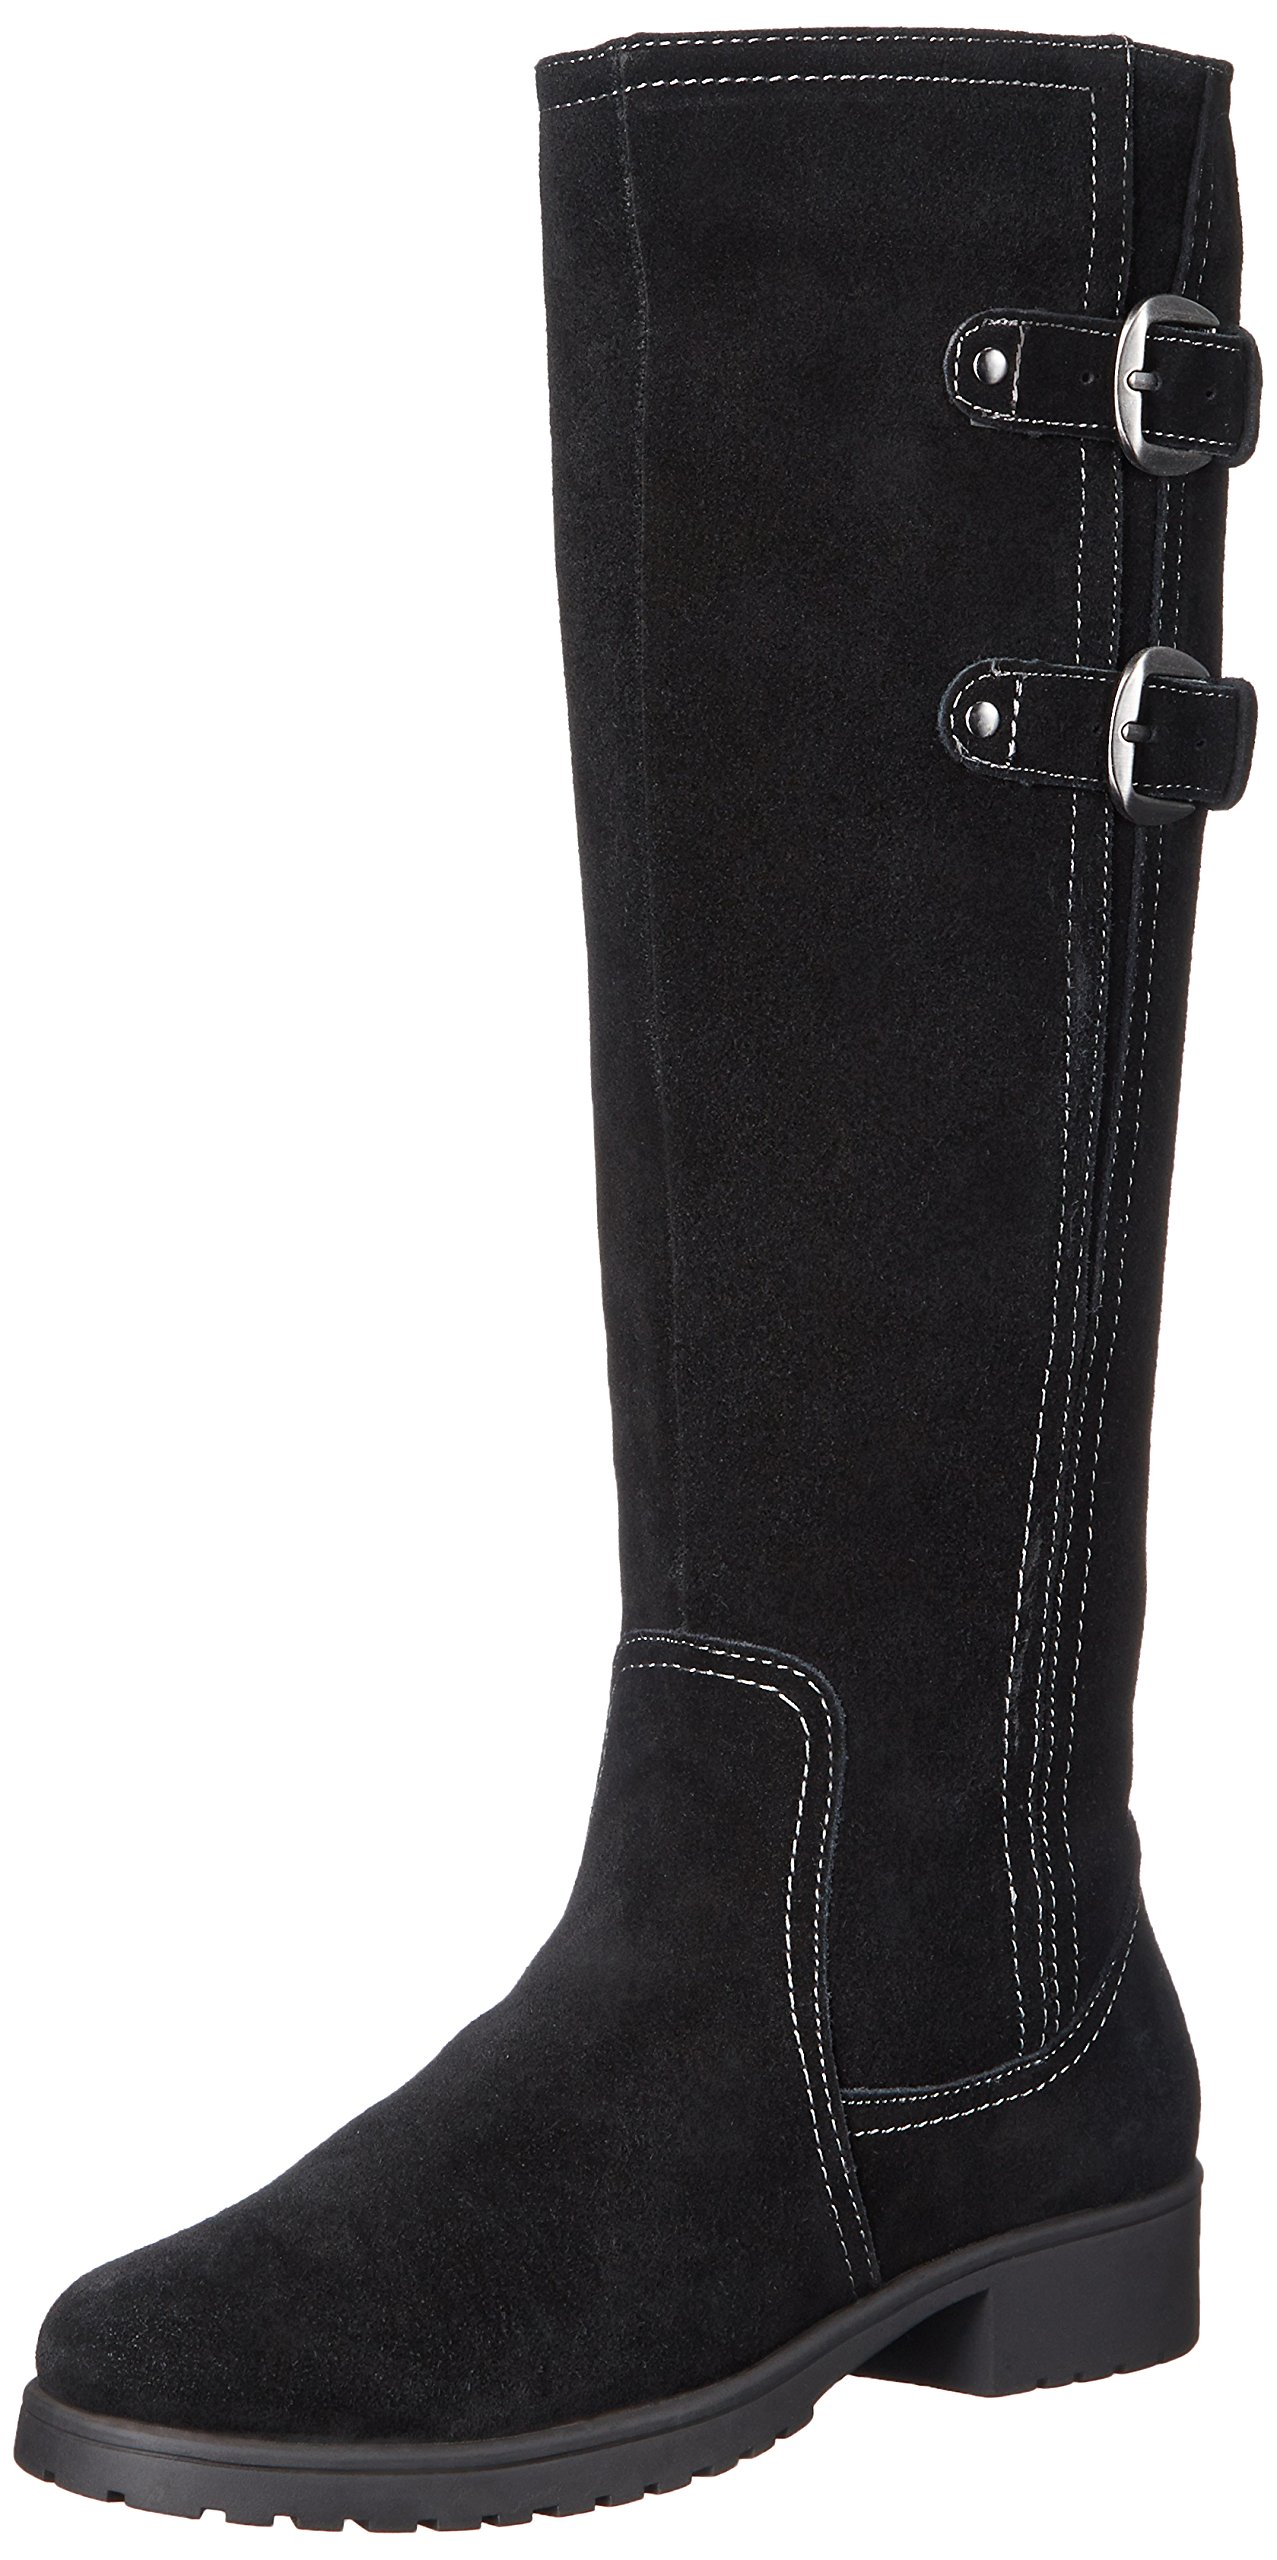 Aerosoles Women's Love Note Riding Boot,Black Suede,7 M US